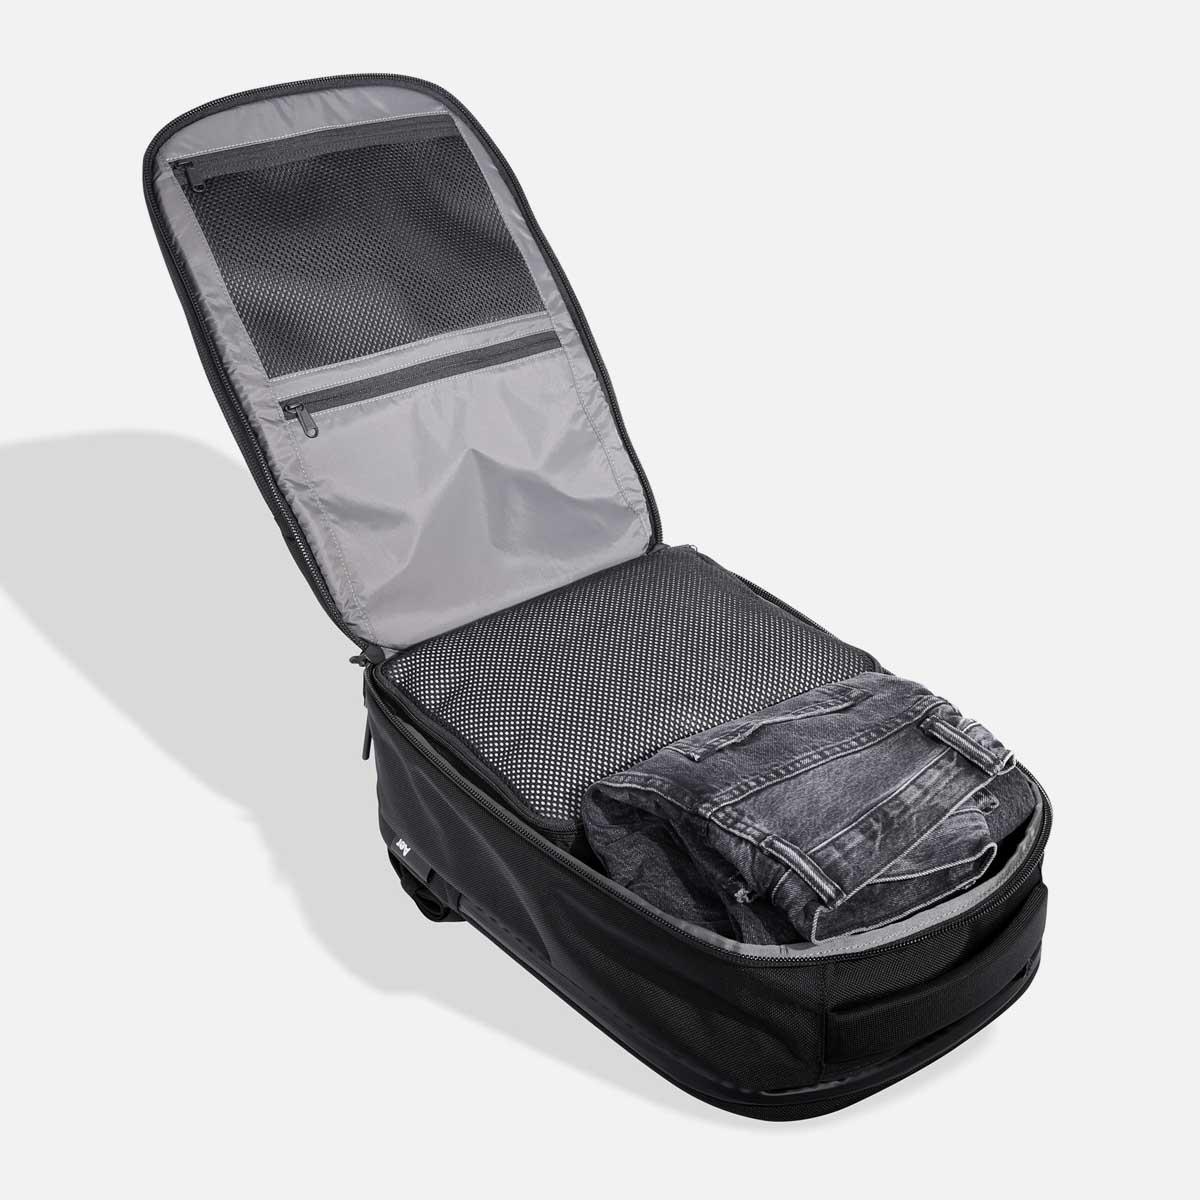 AER21022_travelpack2small_main.jpg